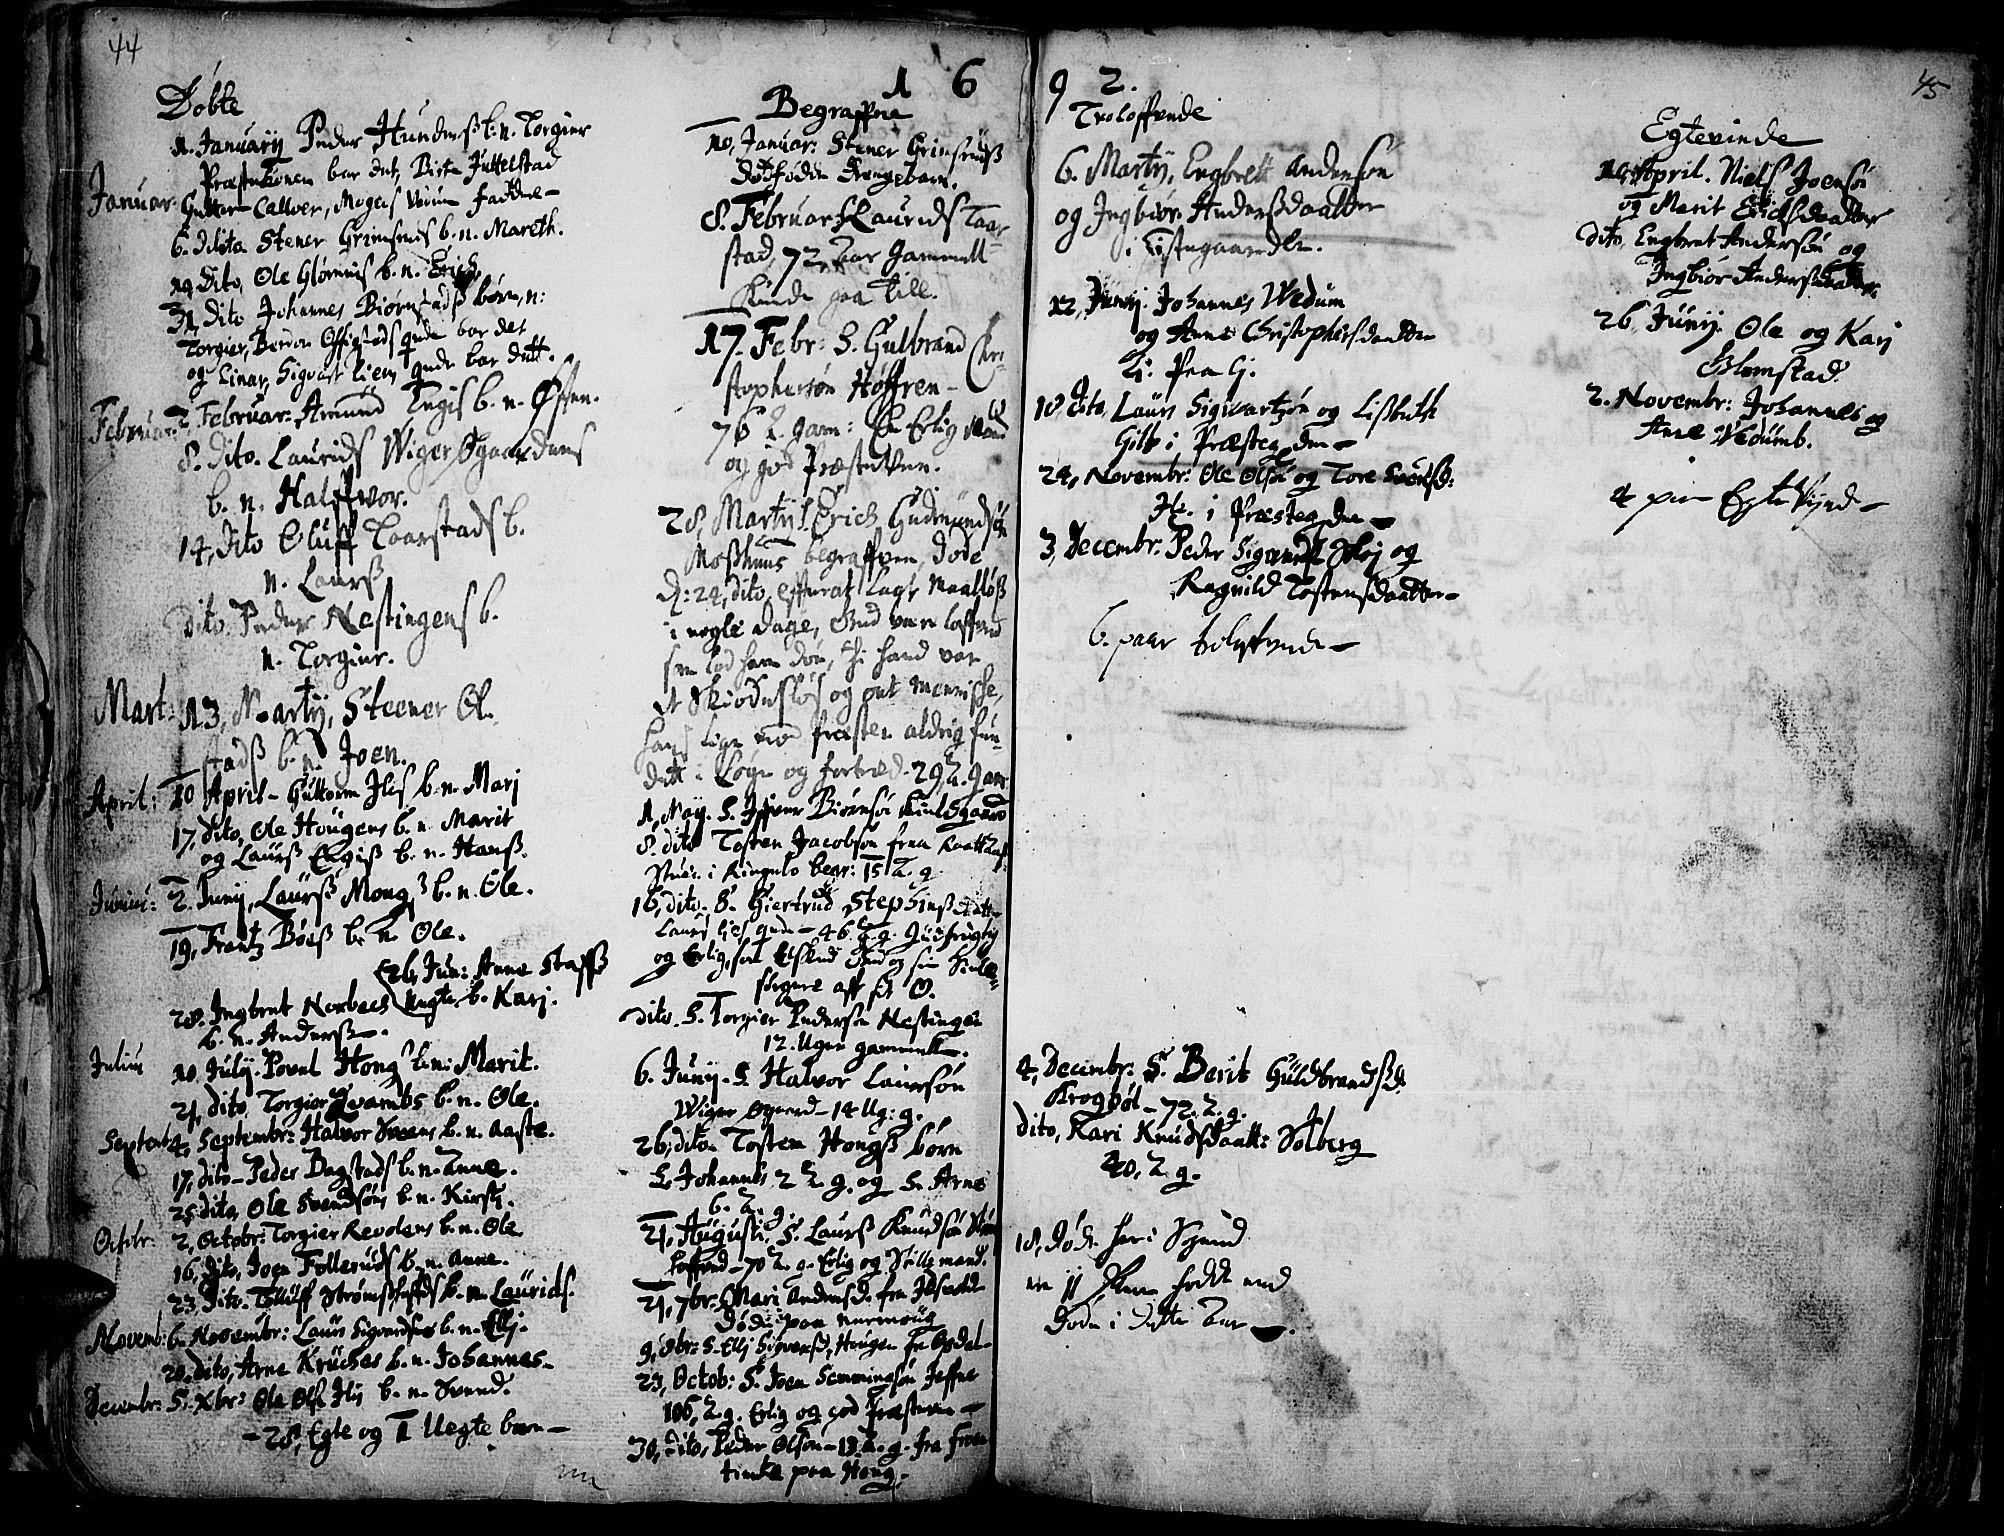 SAH, Øyer prestekontor, Ministerialbok nr. 1, 1671-1727, s. 44-45